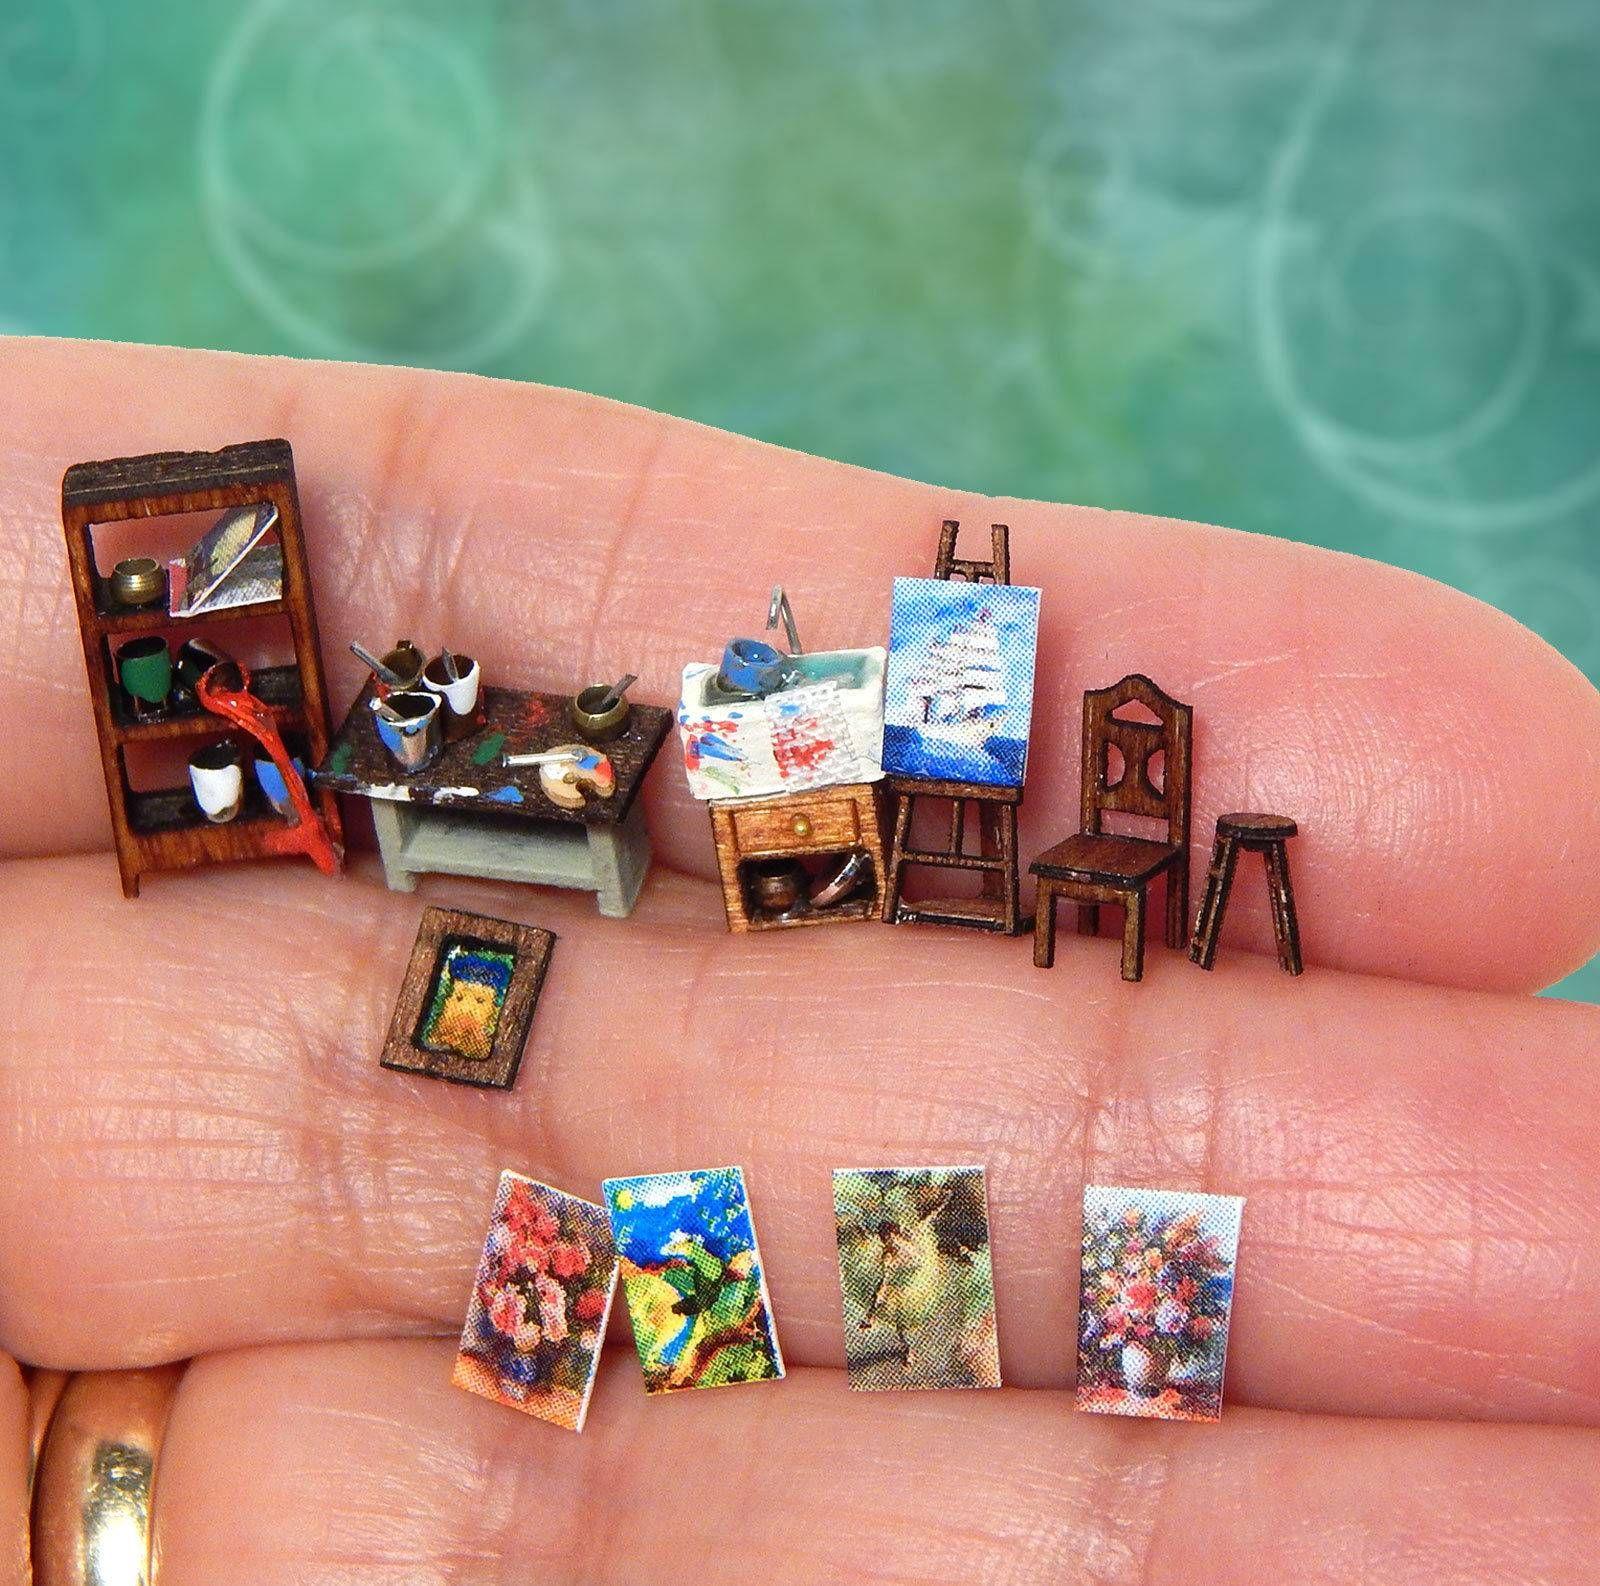 cool 1 144th Scale Dollhouse Miniature Artist Studio Furnishings